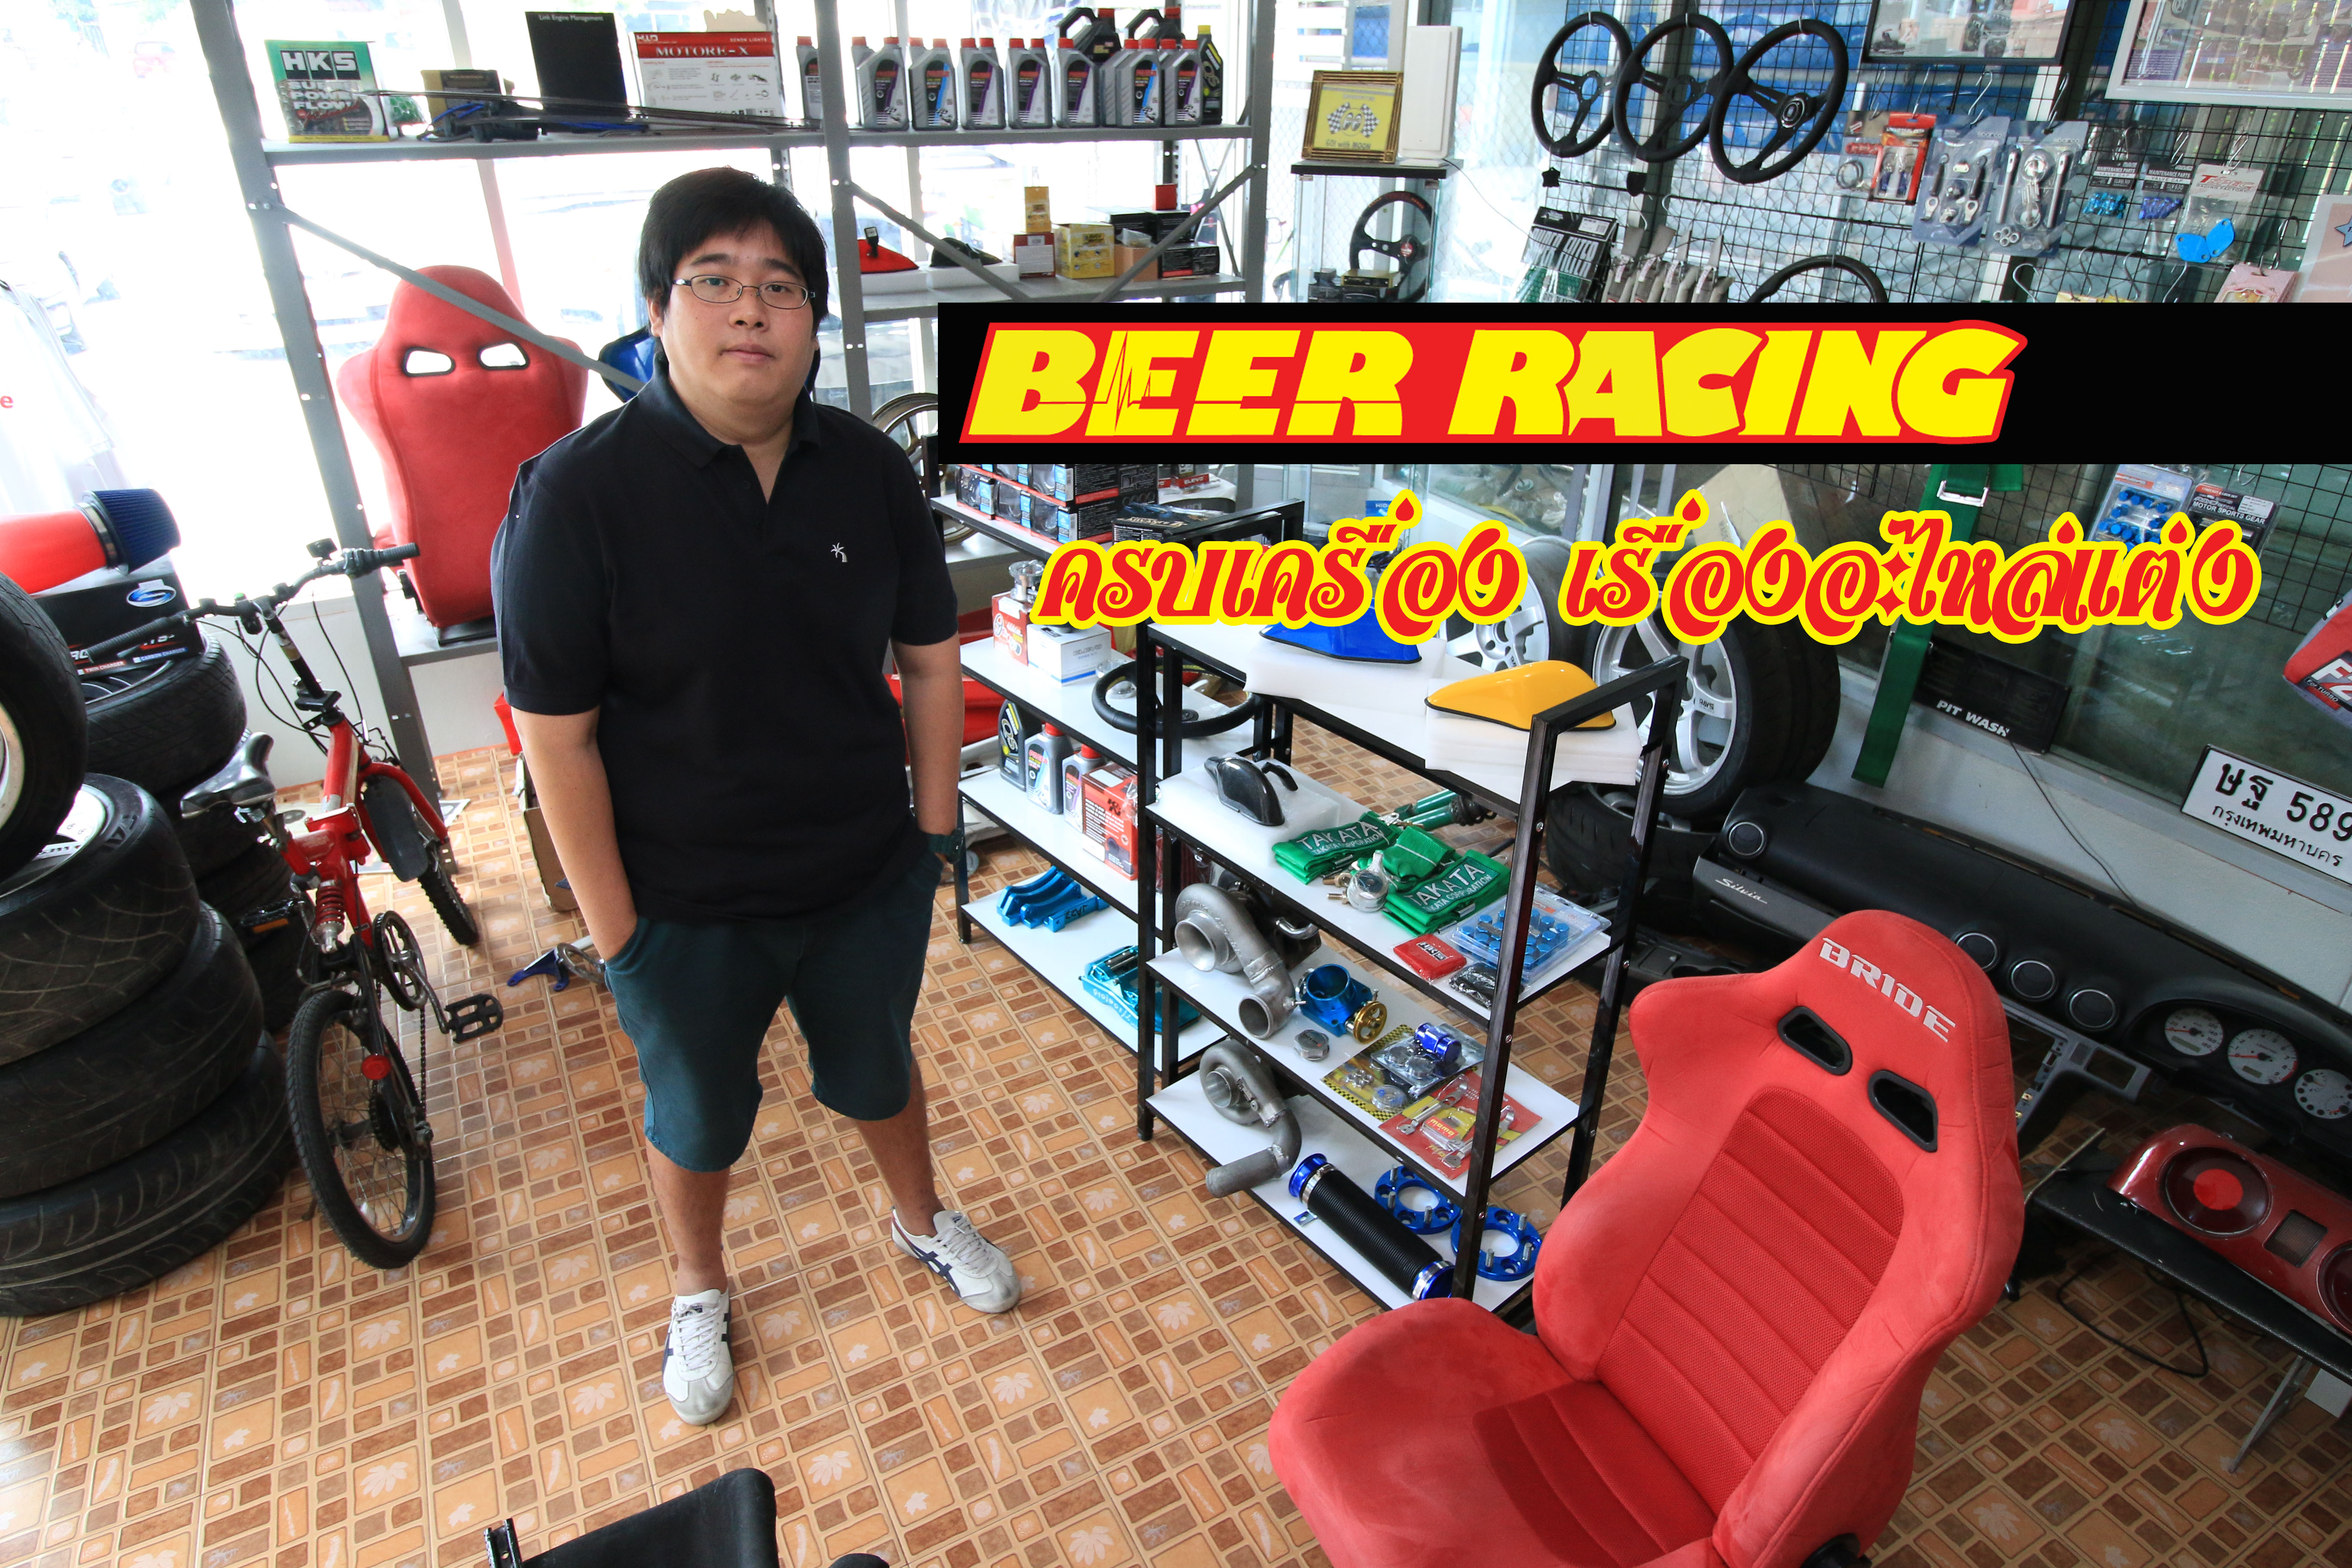 Beer Racing ครบเครื่องเรื่องอะไหล่ซิ่ง